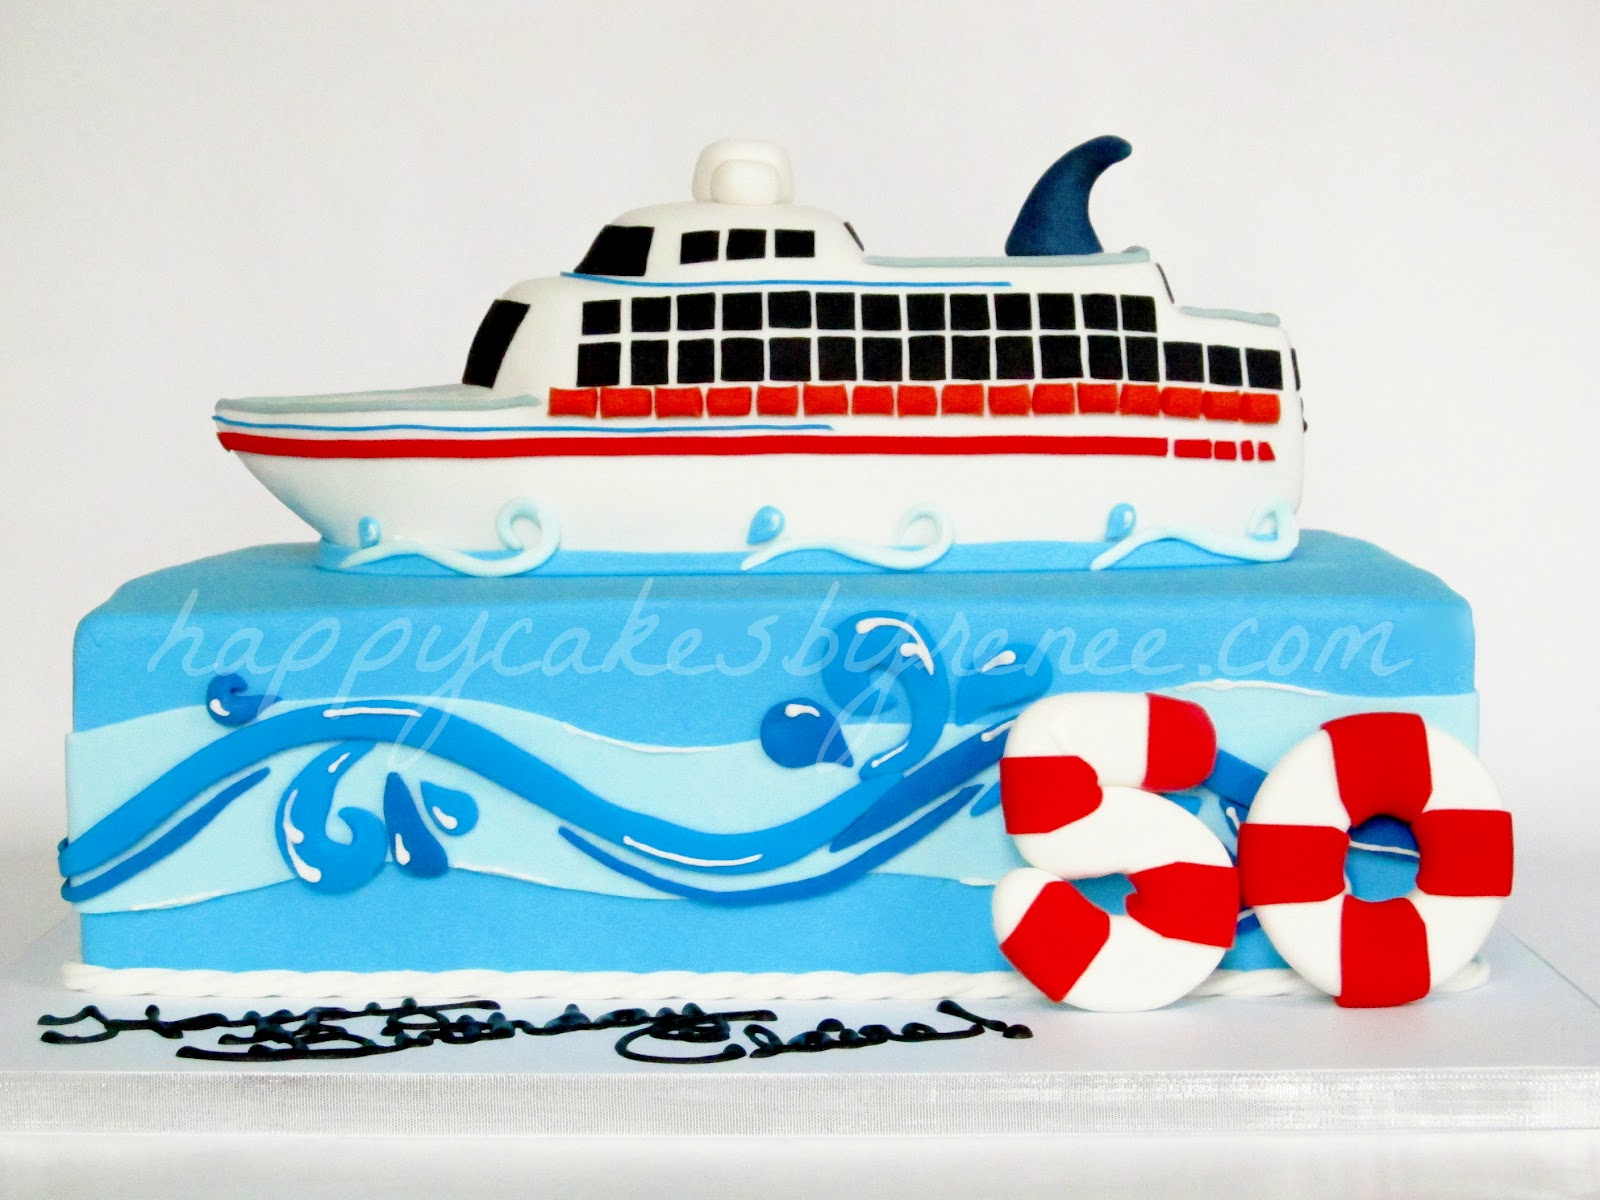 Th Birthday Cruise Ship Cake Renee Conner Cake Design - Cruise ship cake